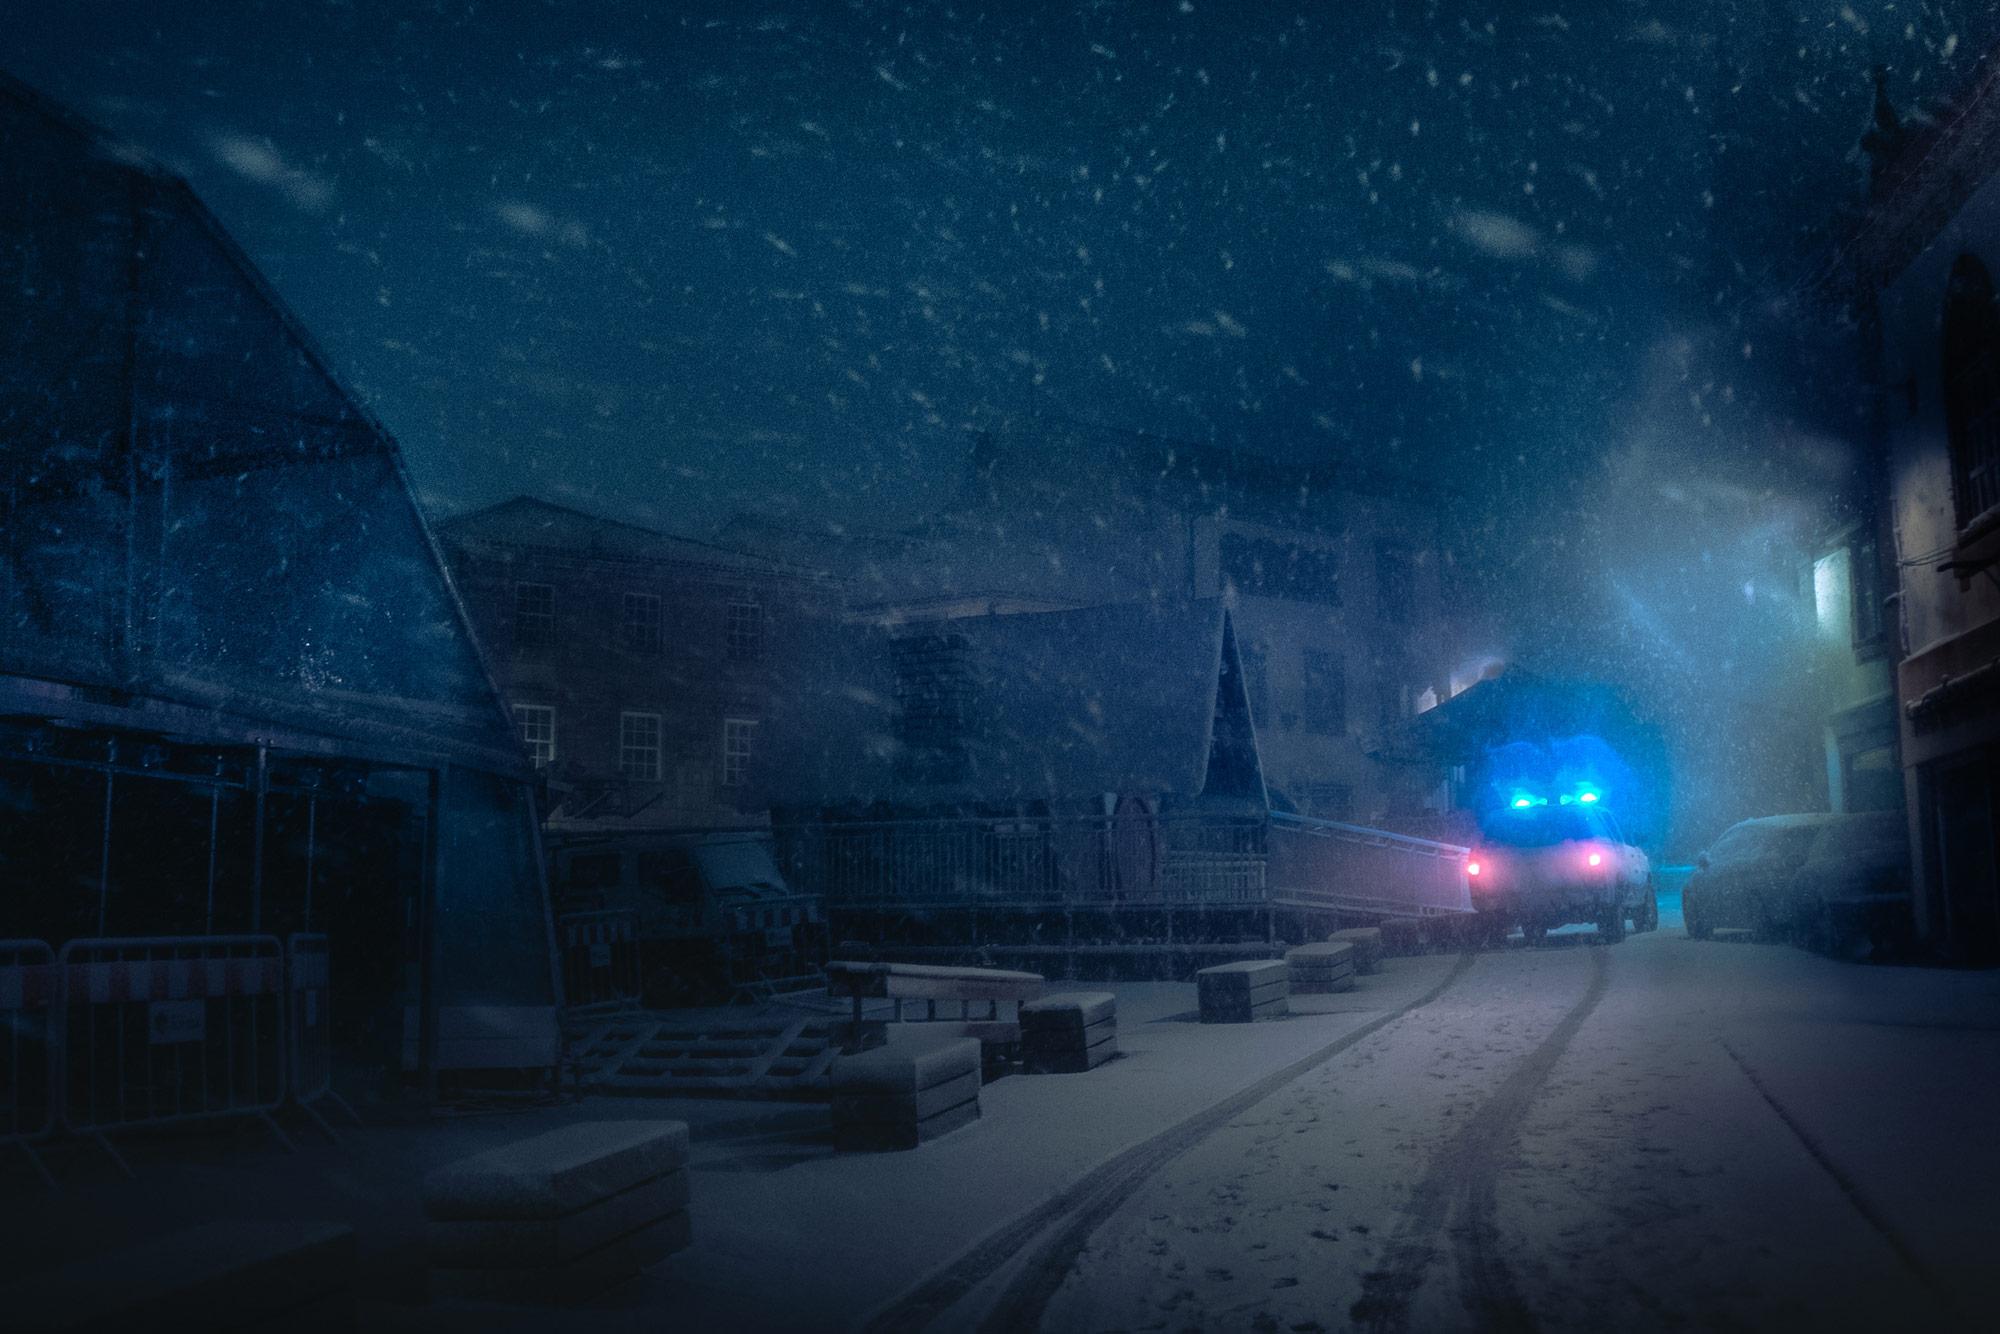 Headlights Cut Through Dense Fog In Moody Images Of Cars At Night By Unique Night Stroll Tao Tajima